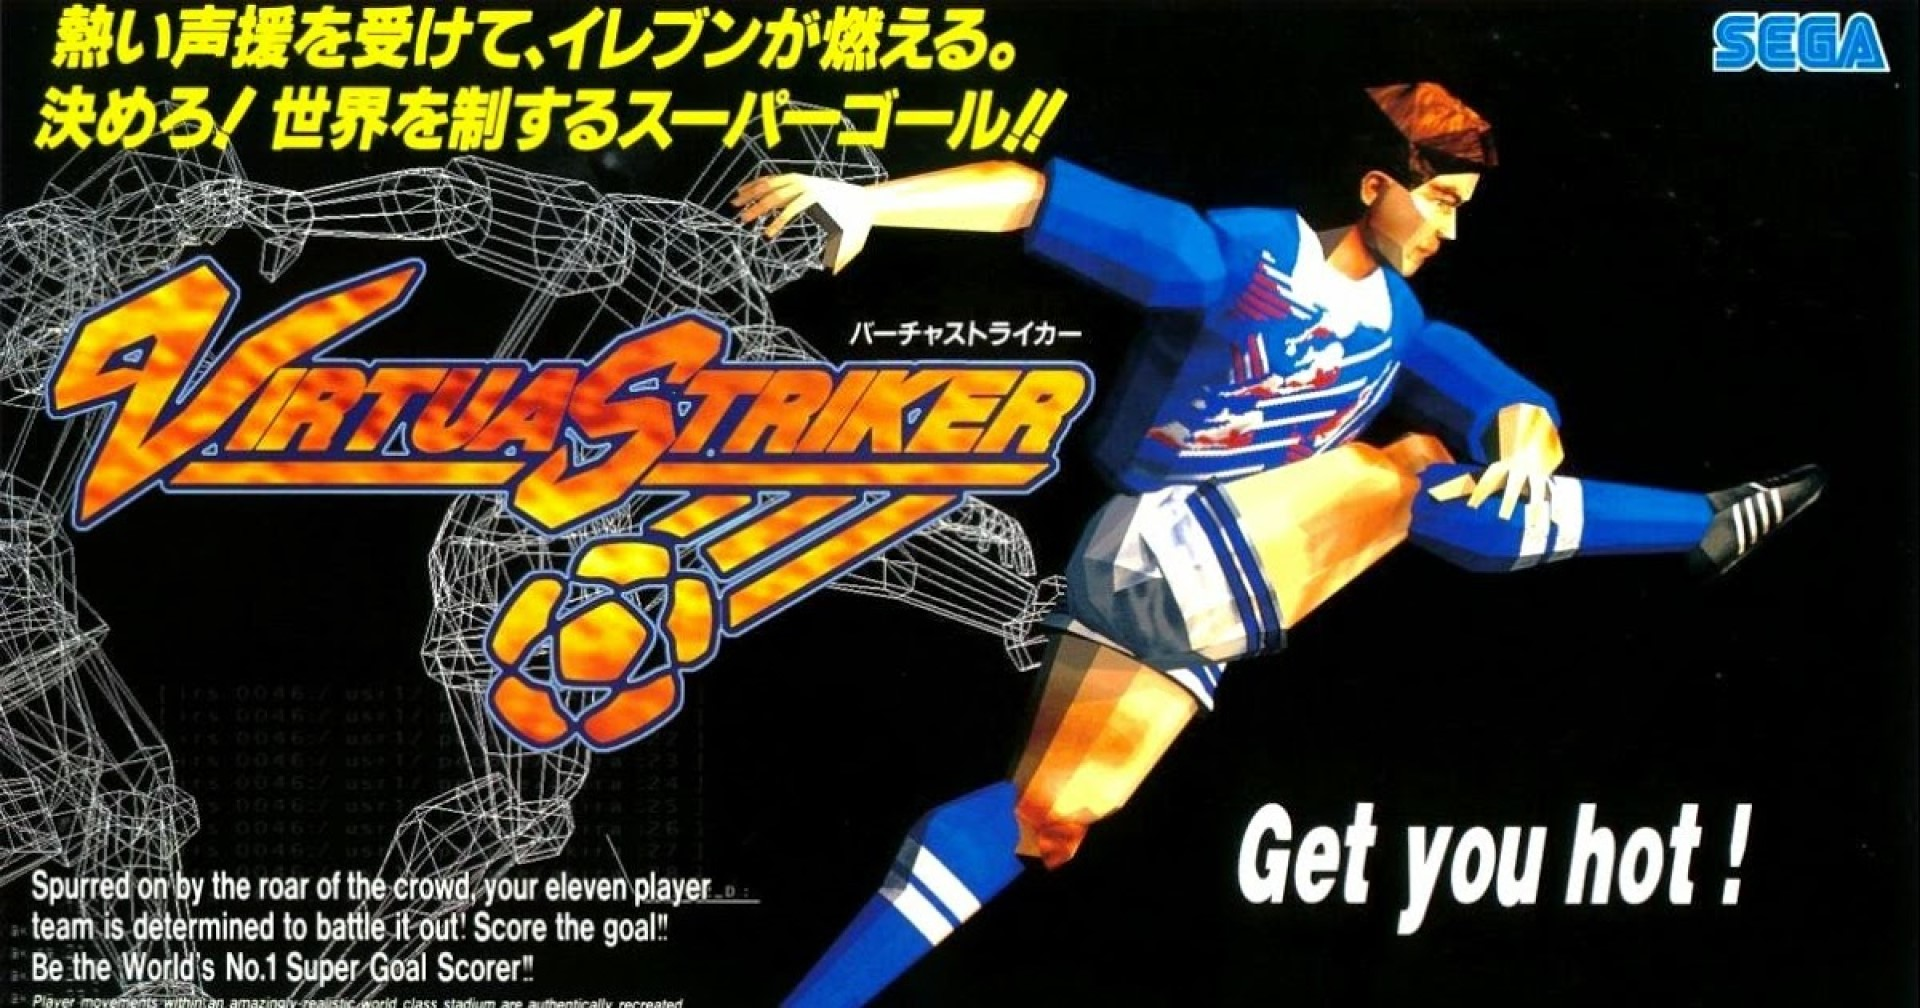 Virtua_Striker_Flyer_01